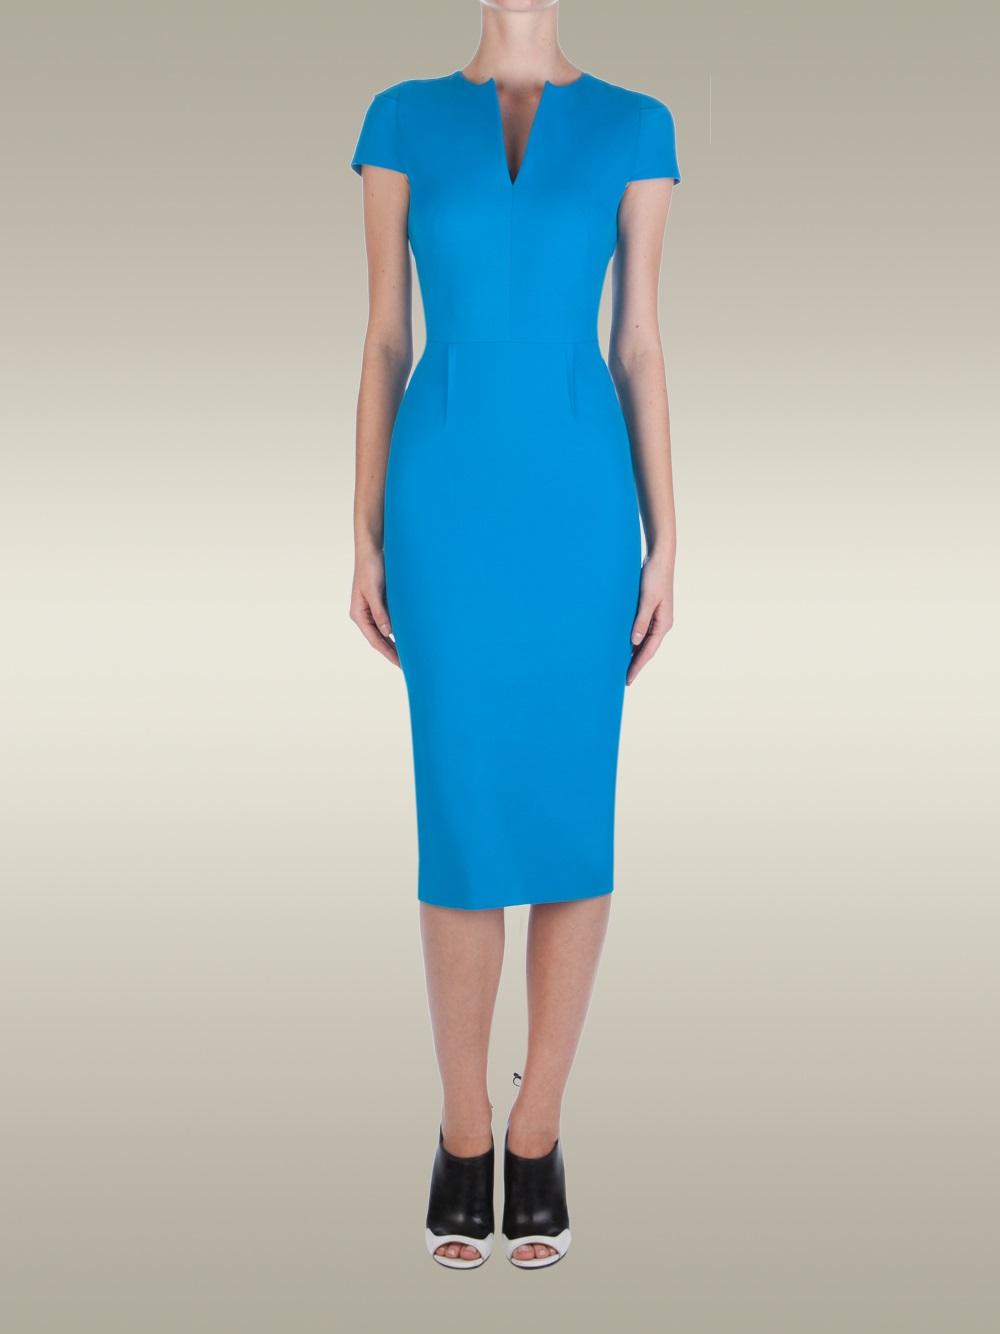 68571c98562 Lyst - Roland Mouret Delphinus Dress in Blue